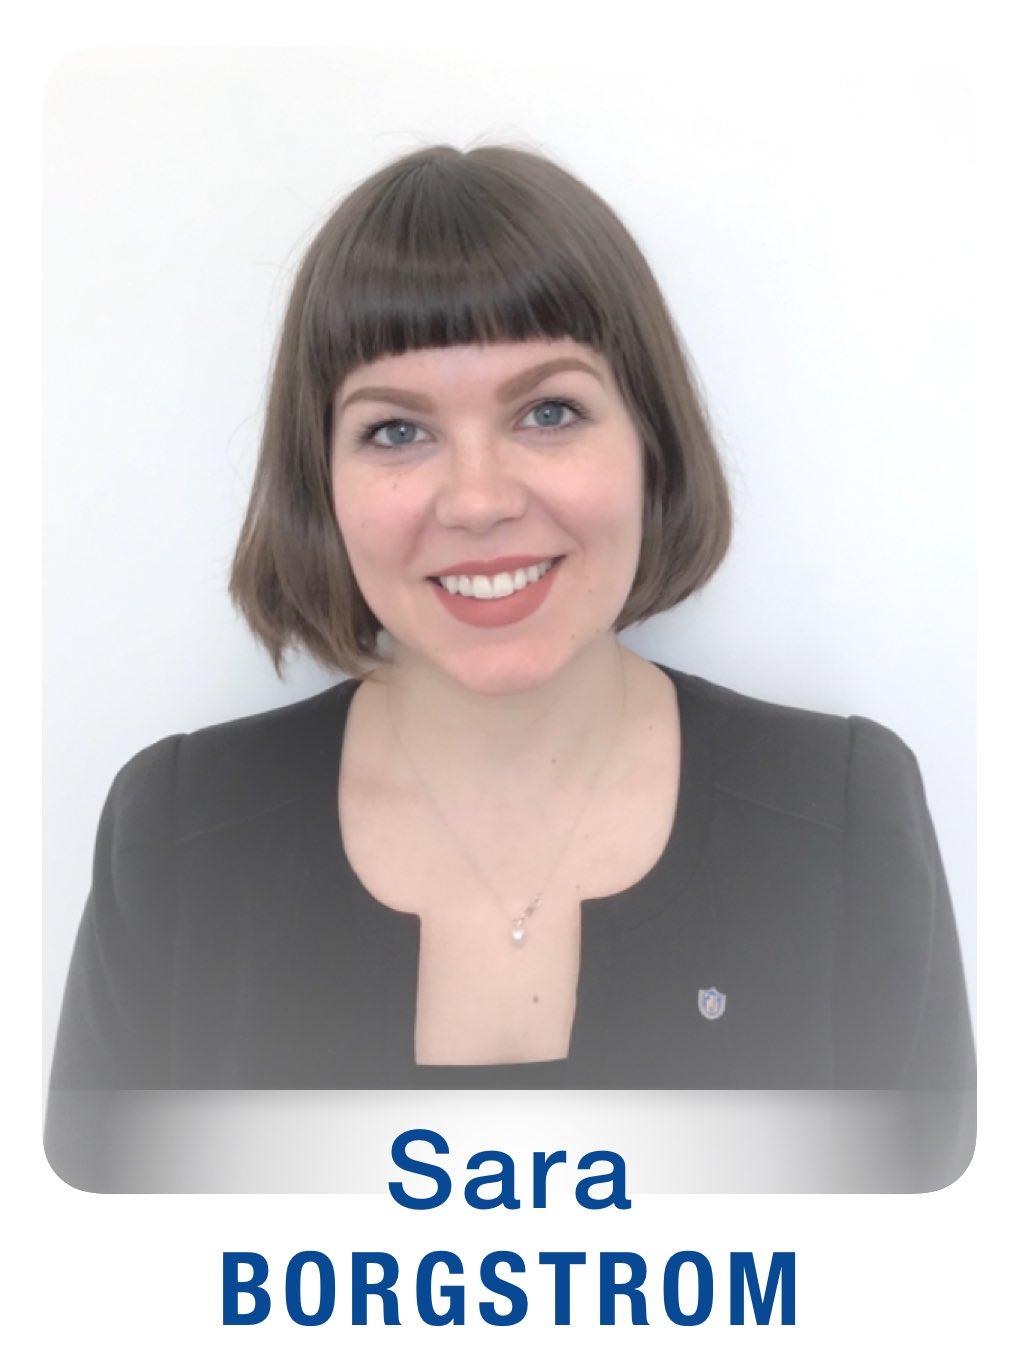 New GTI Sara Borgstrom Photo